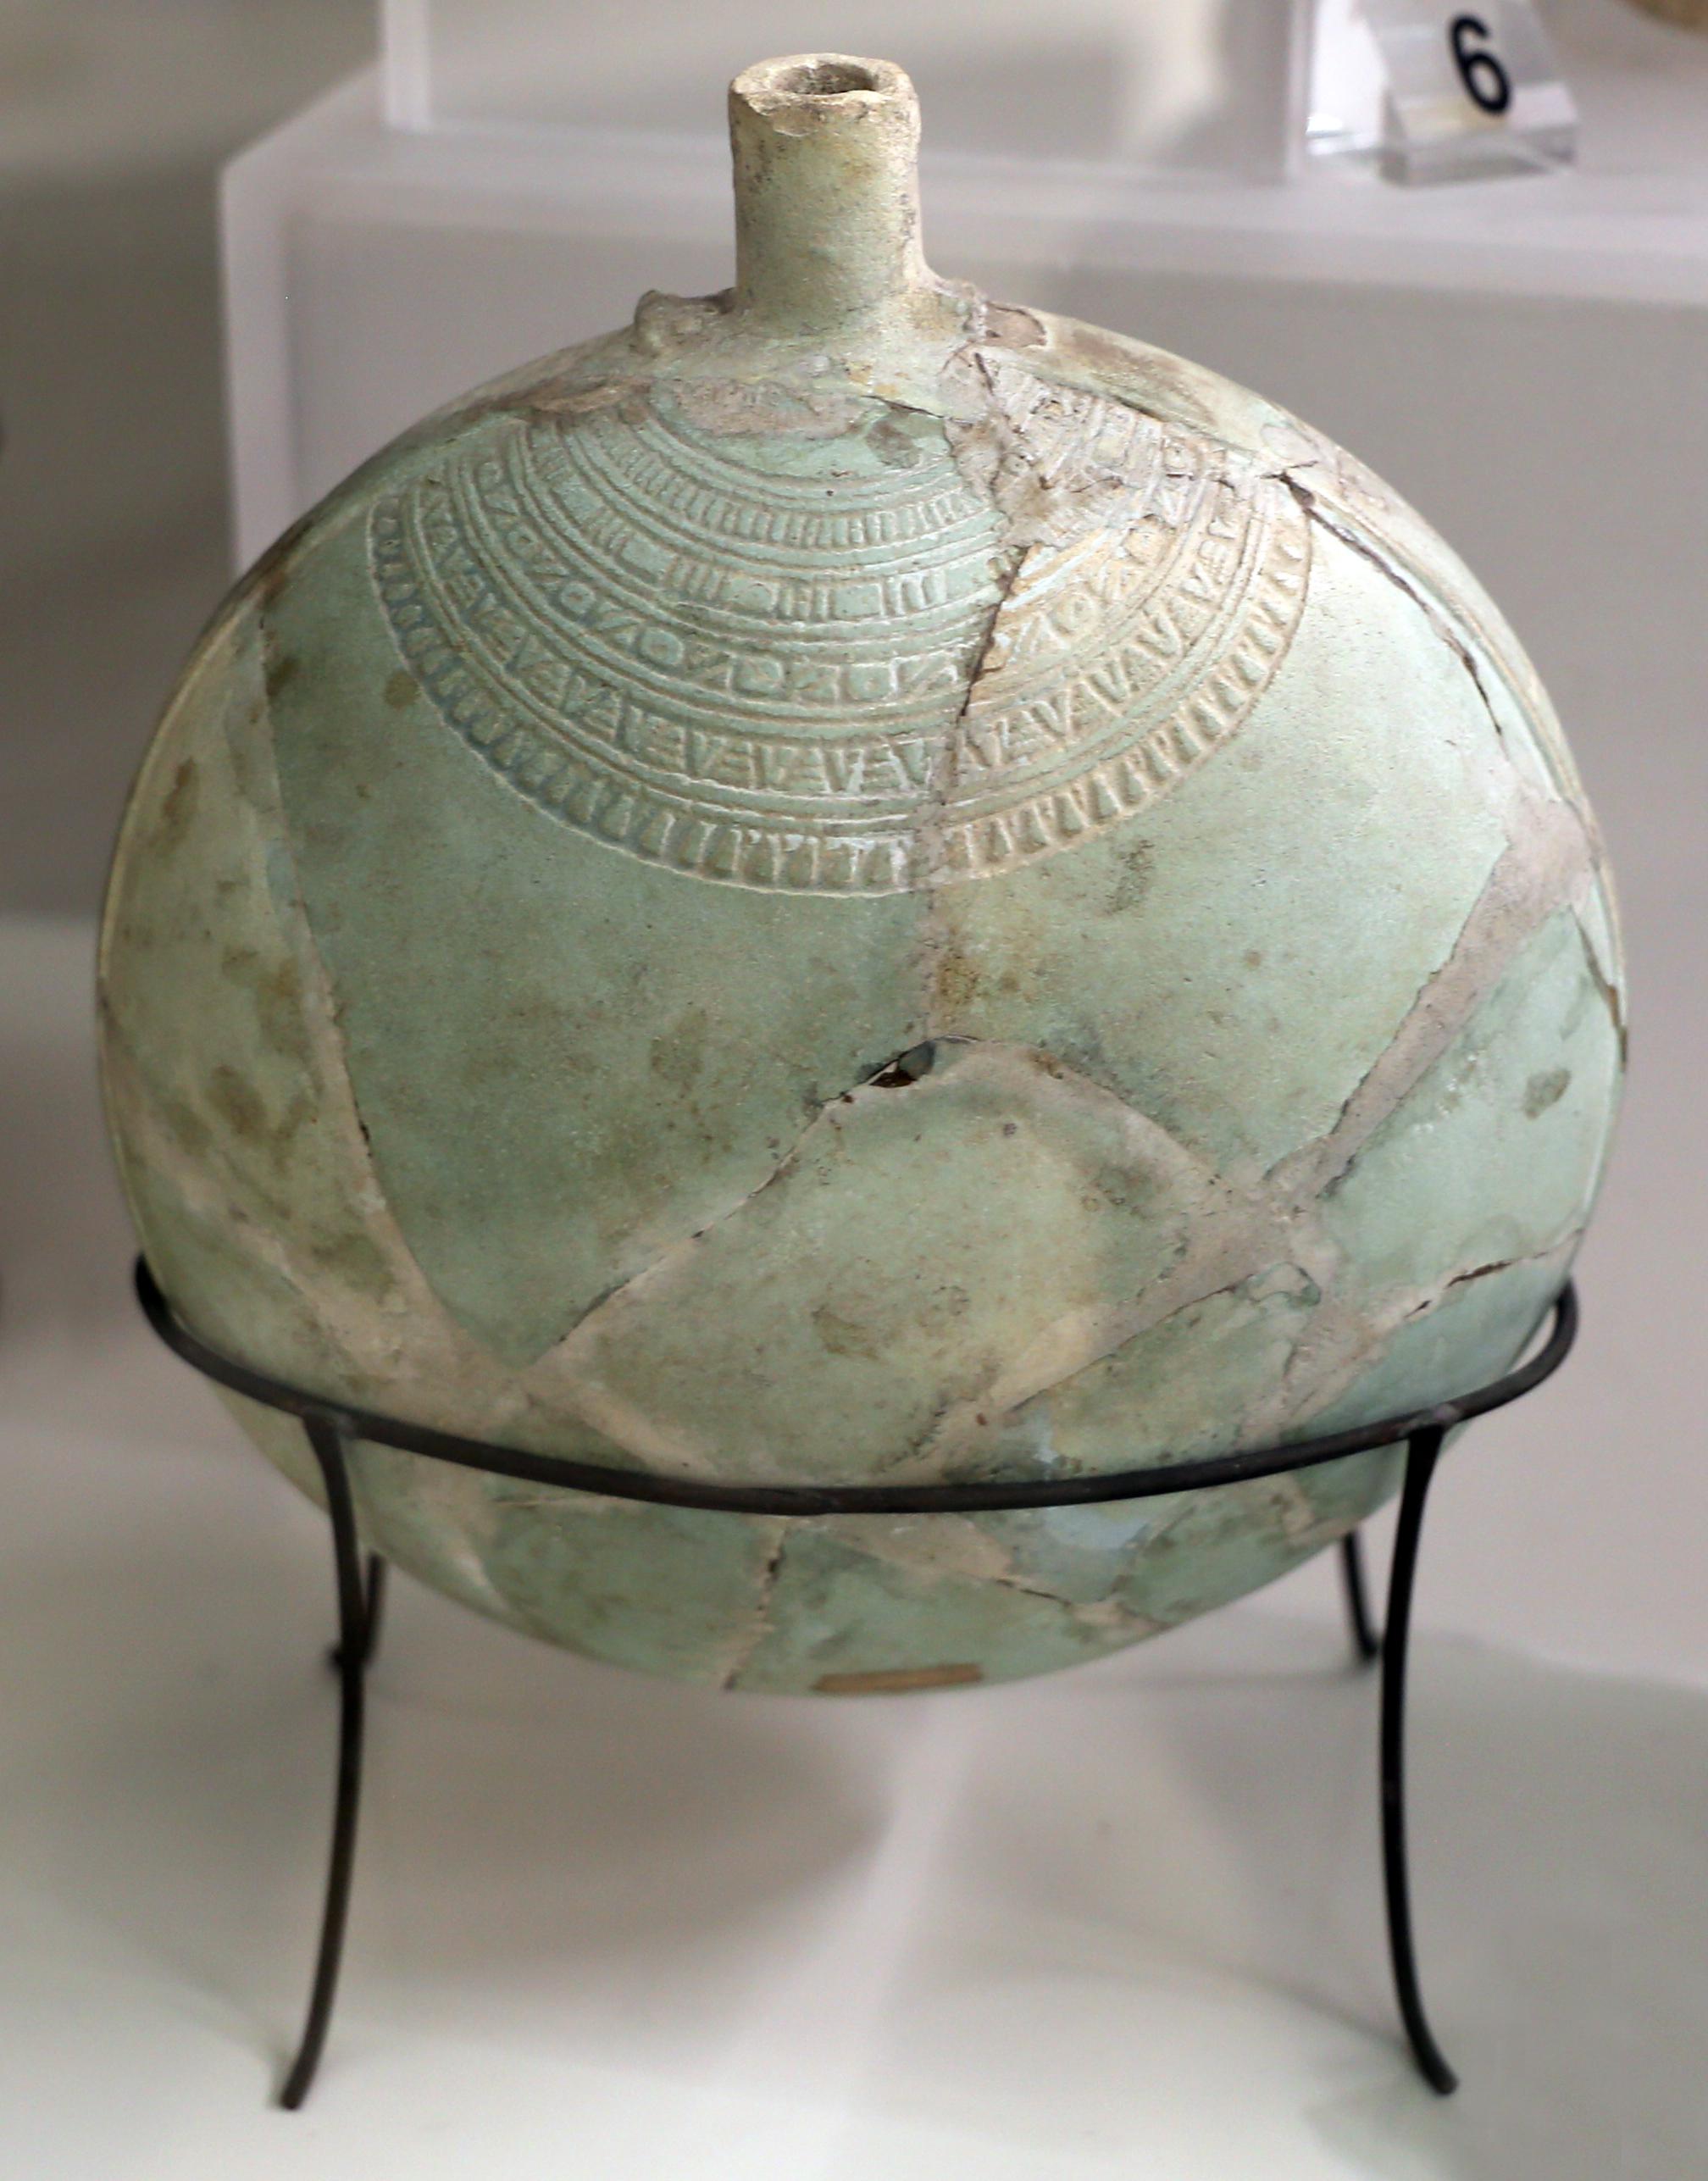 dating keramikk arkeologi 100 gratis dating Johannesburg